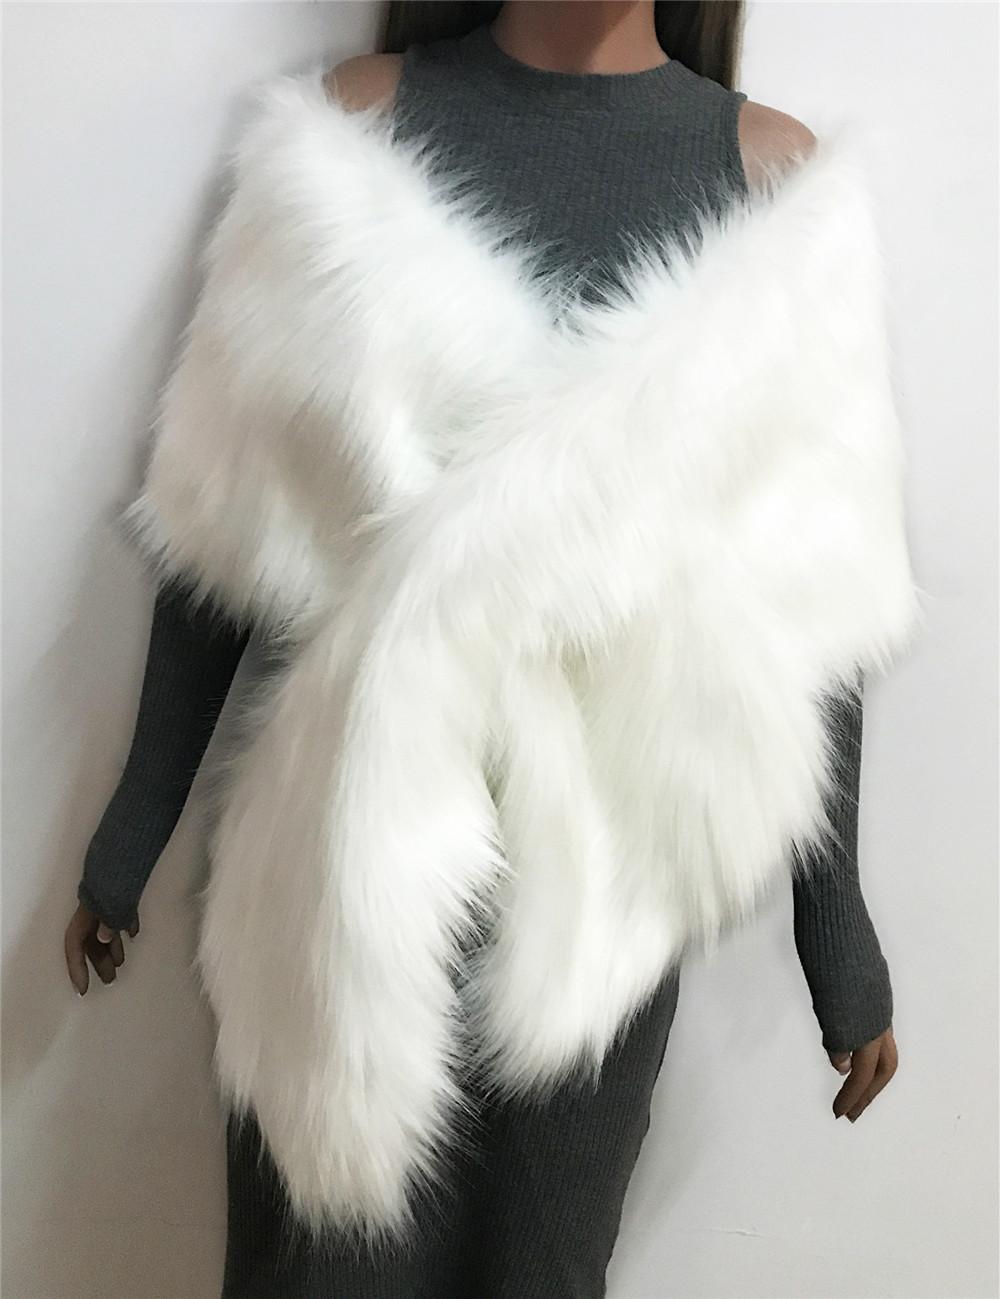 The autumn and winter new imitation fur big cape neck scarf multi-color joker scarf bride dress cross cape (10)